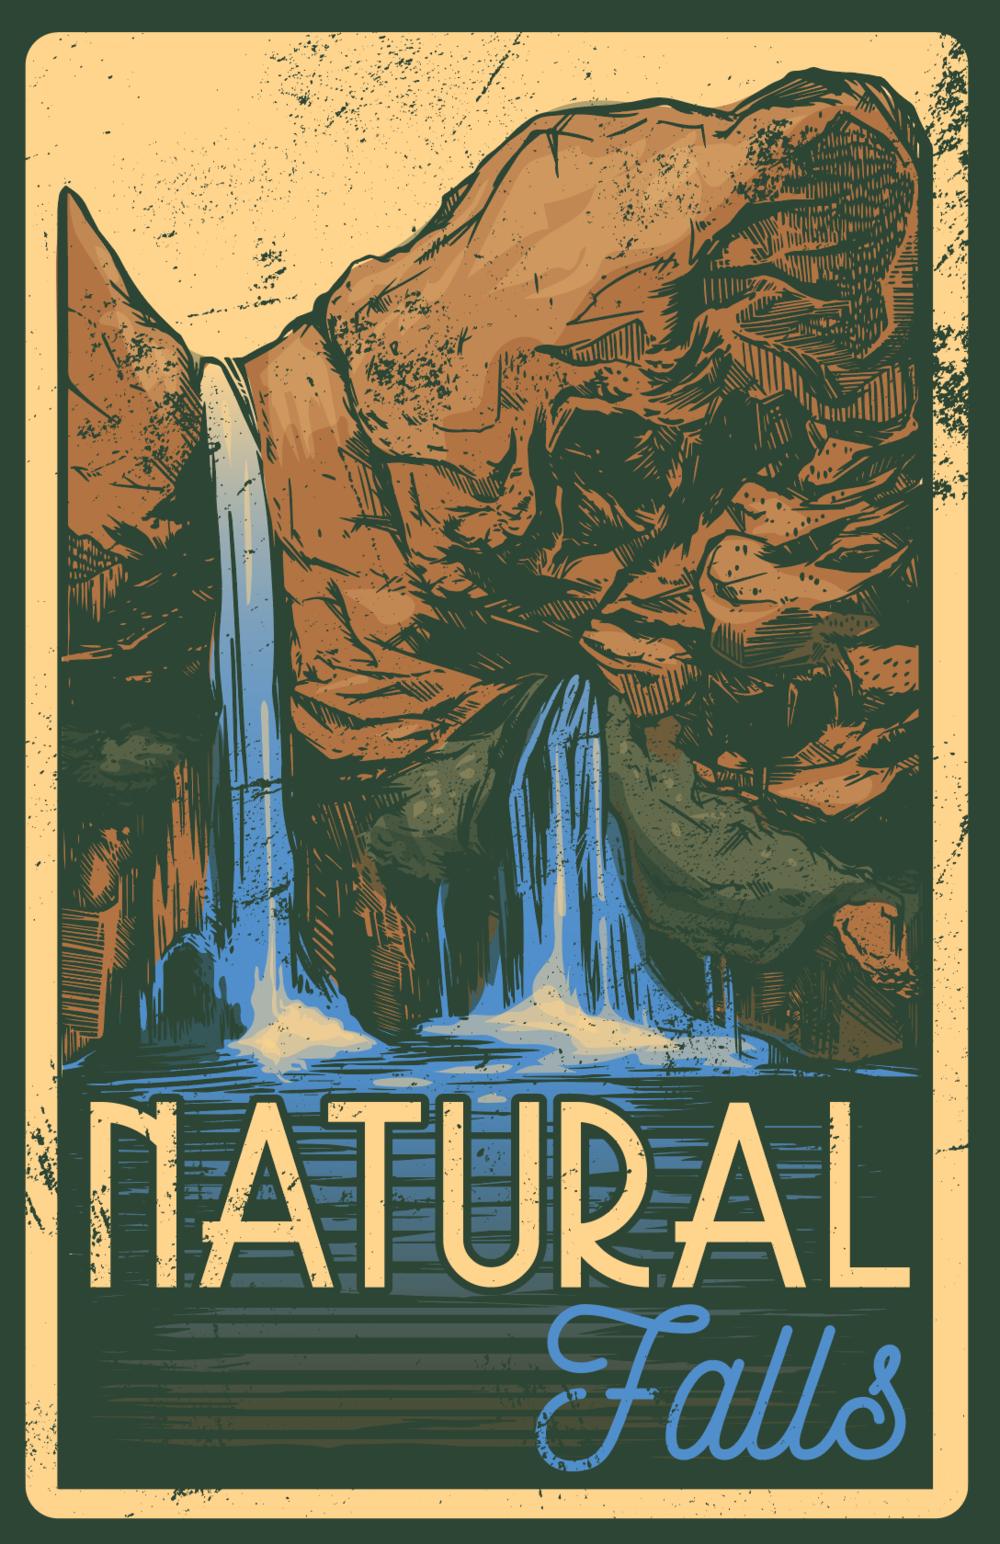 stateparknaturalfalls.png